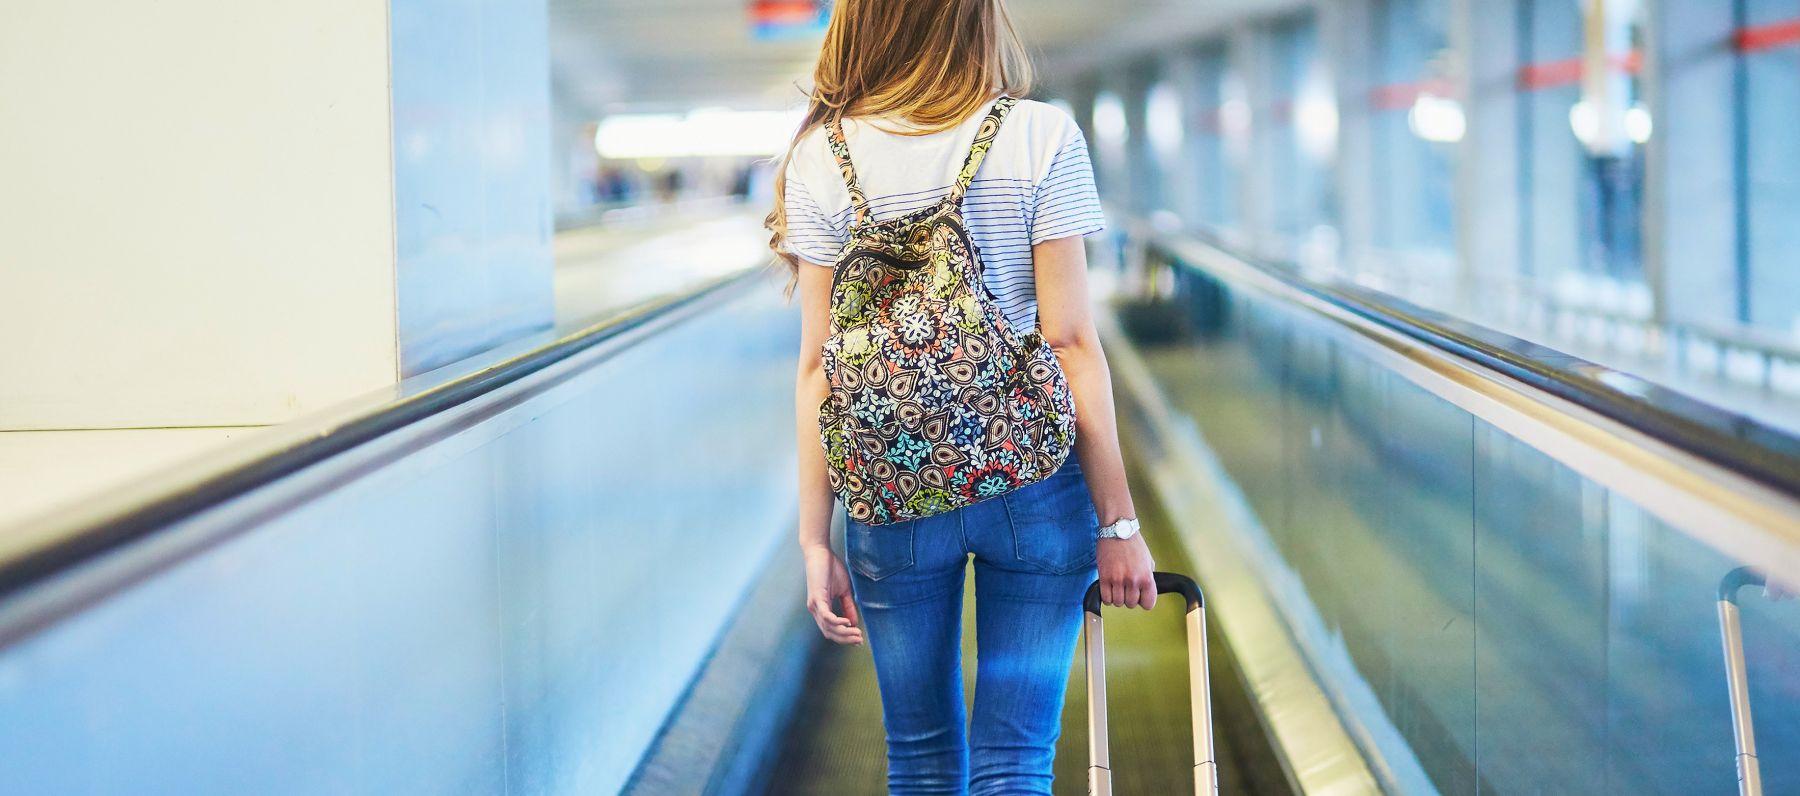 A woman on a travelator